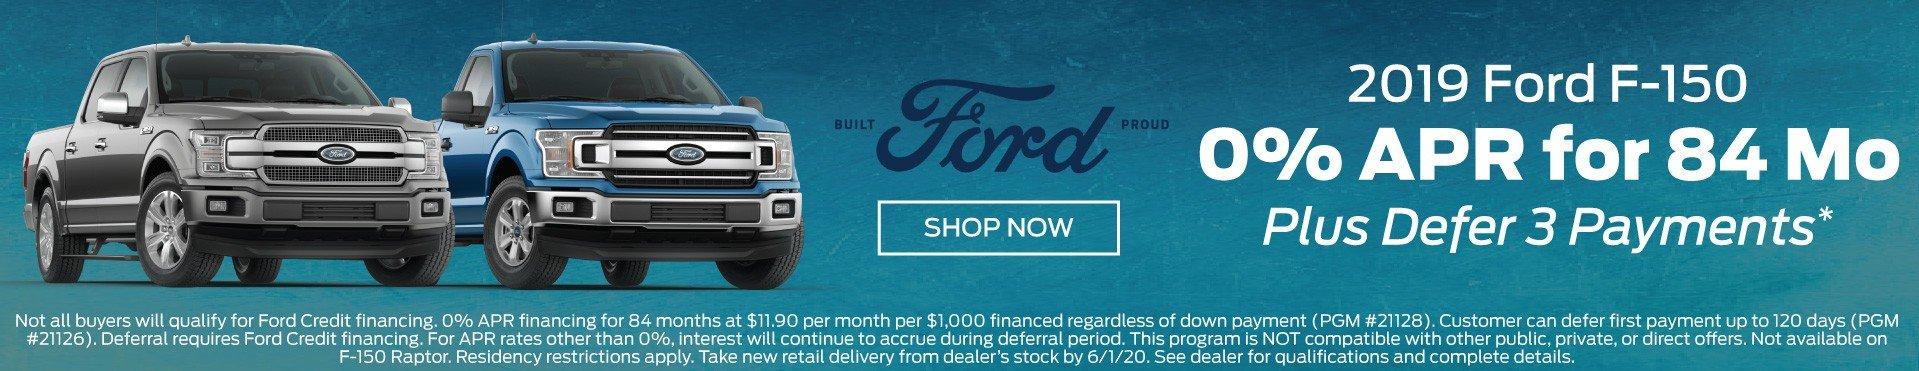 2019 F-150 Incentive 6-1-2020